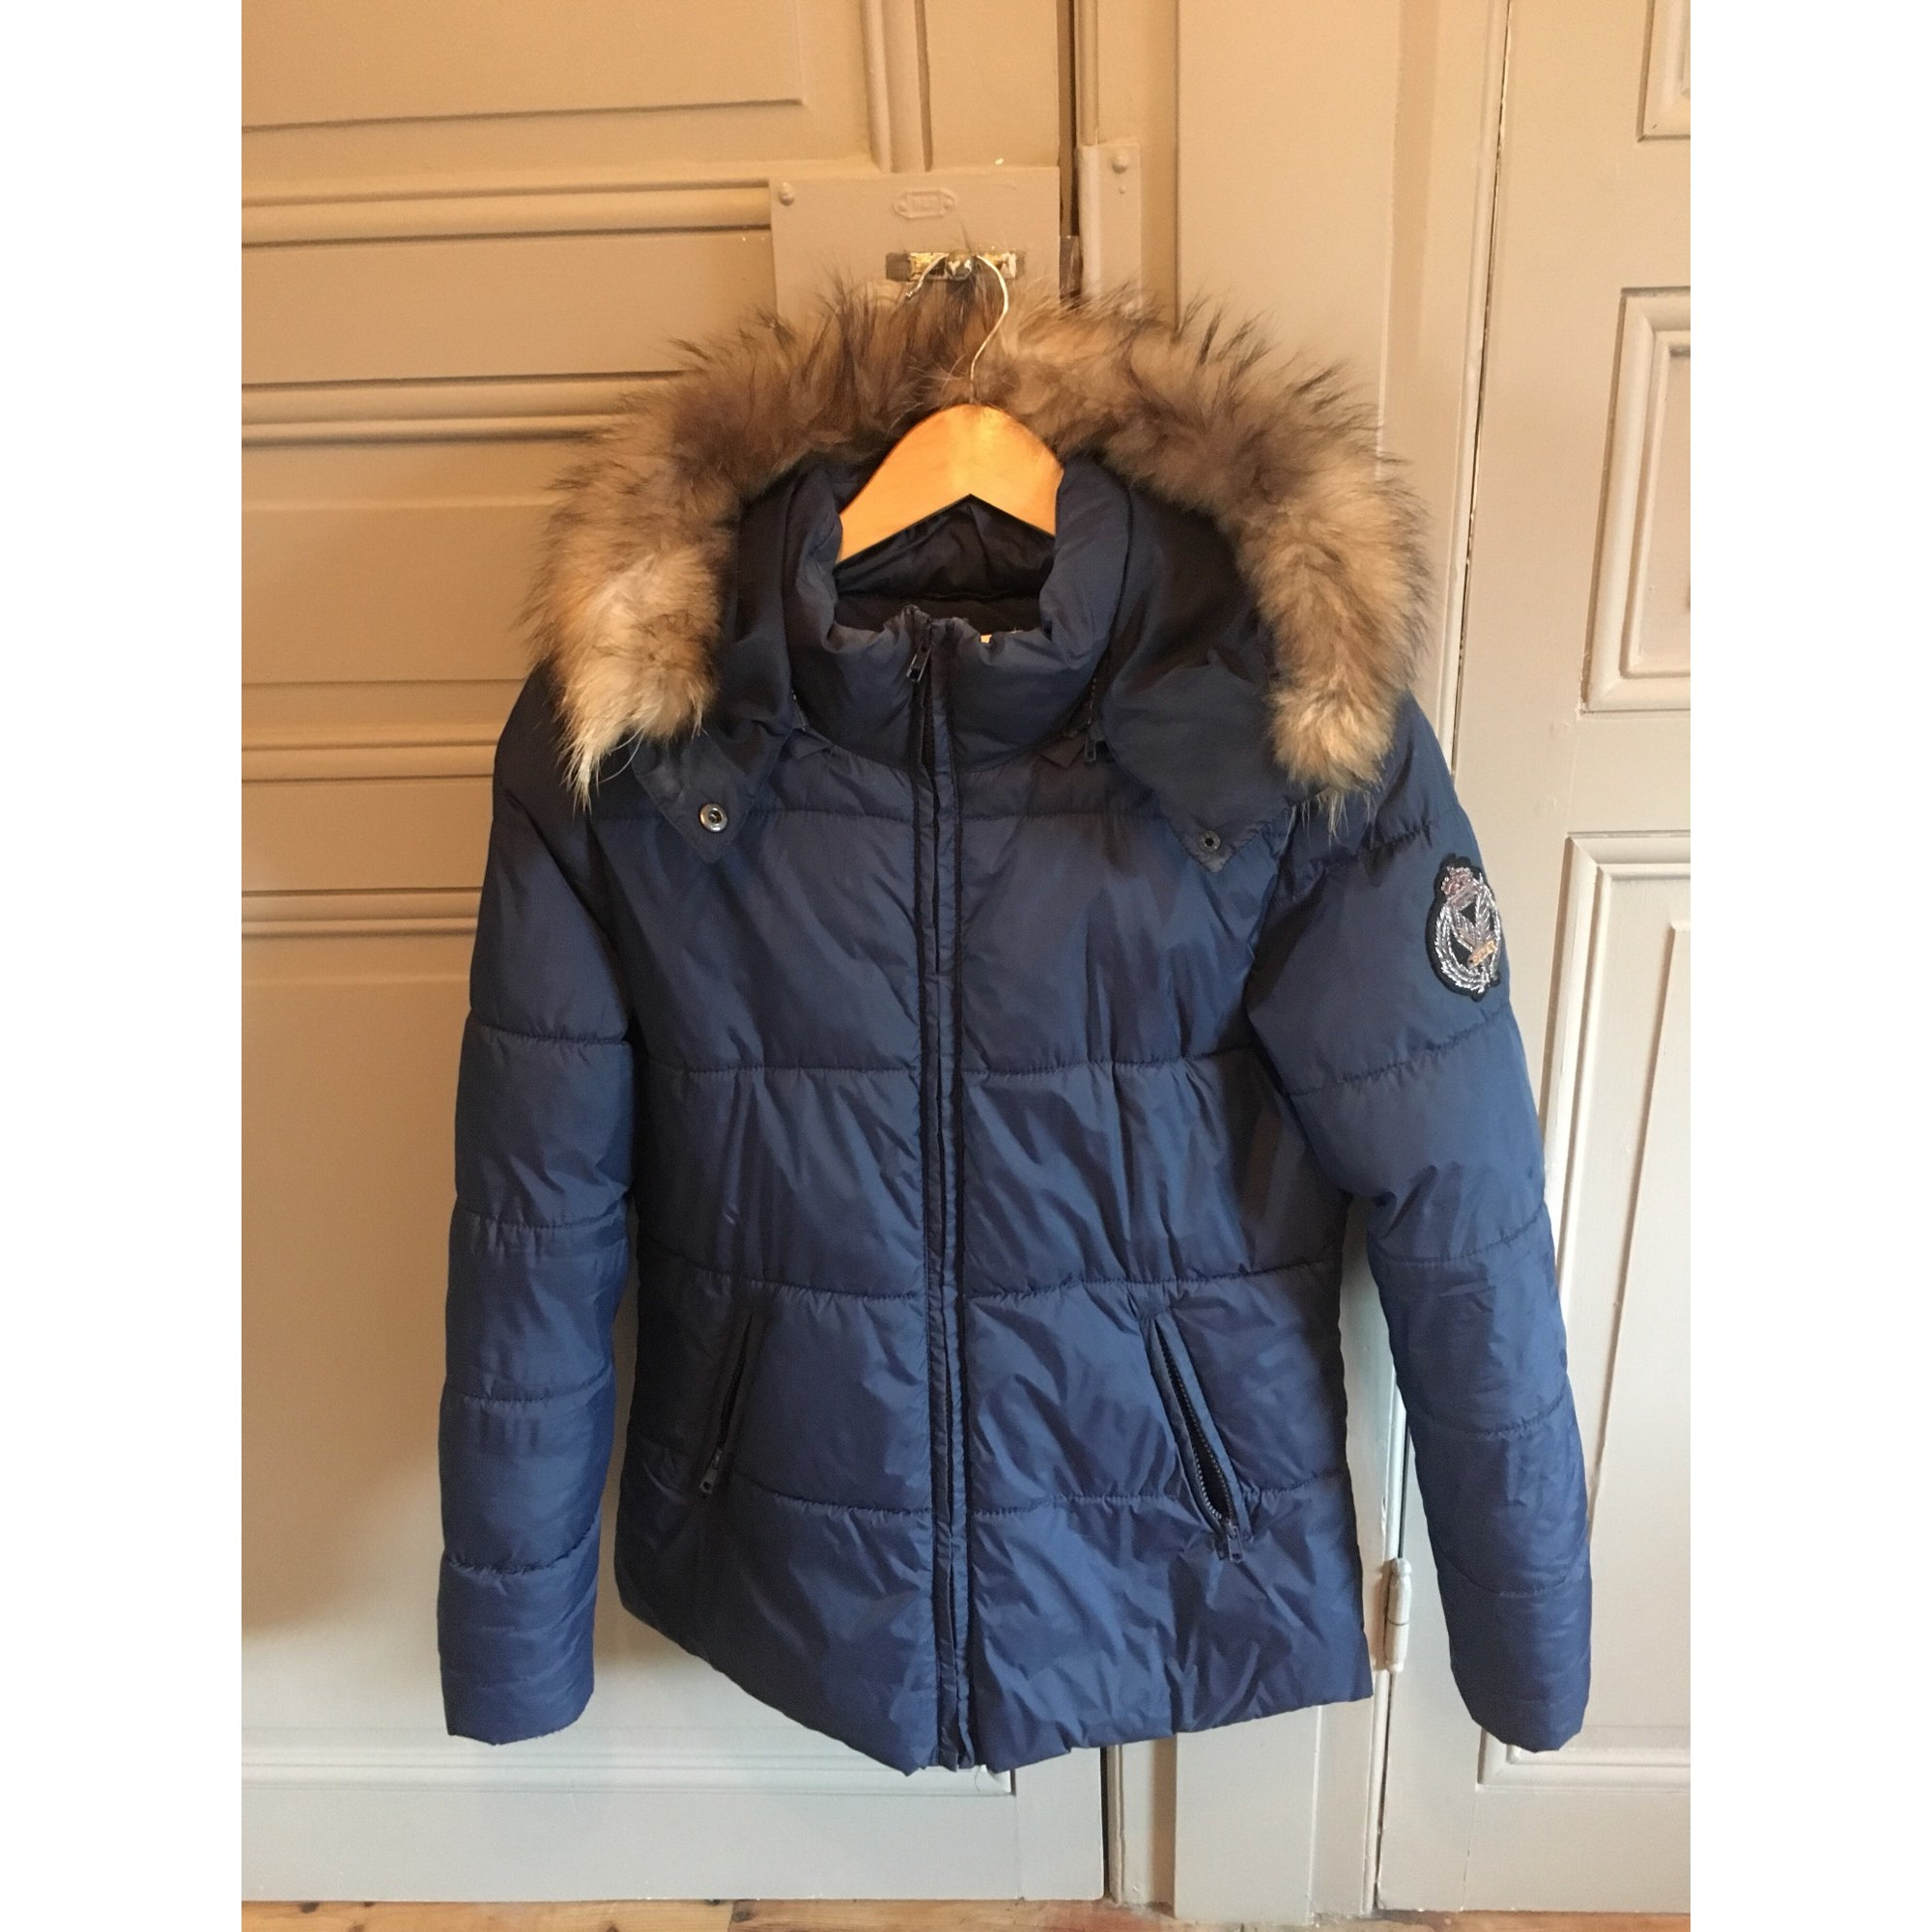 manteau homme bel air